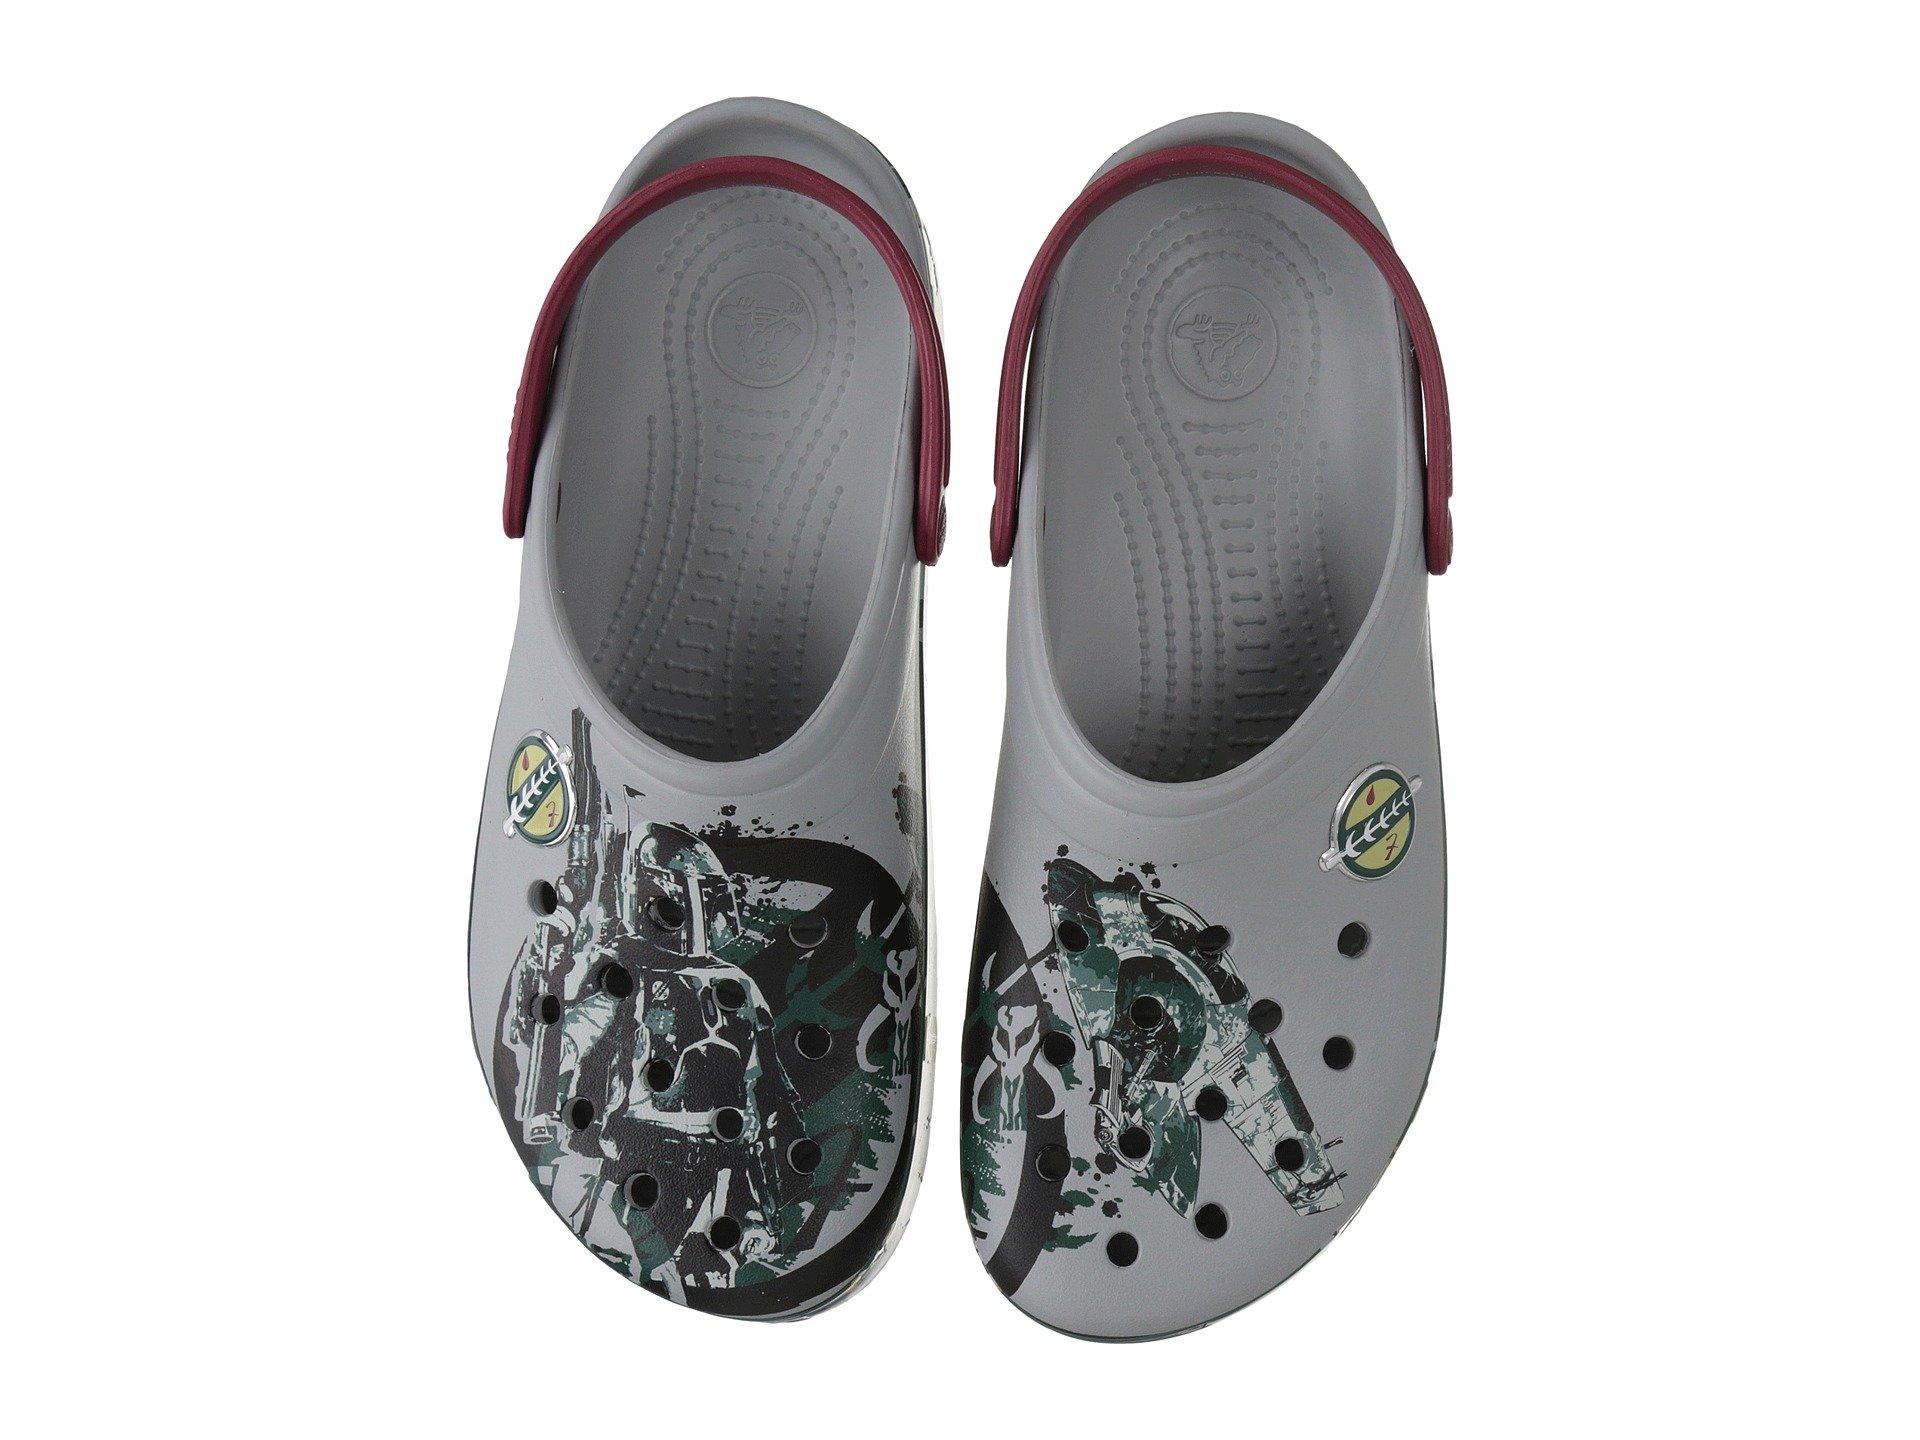 Calzado Sin Talon para Hombre Crocs CB Star Wars Boba Fett Clog  + Crocs en VeoyCompro.net